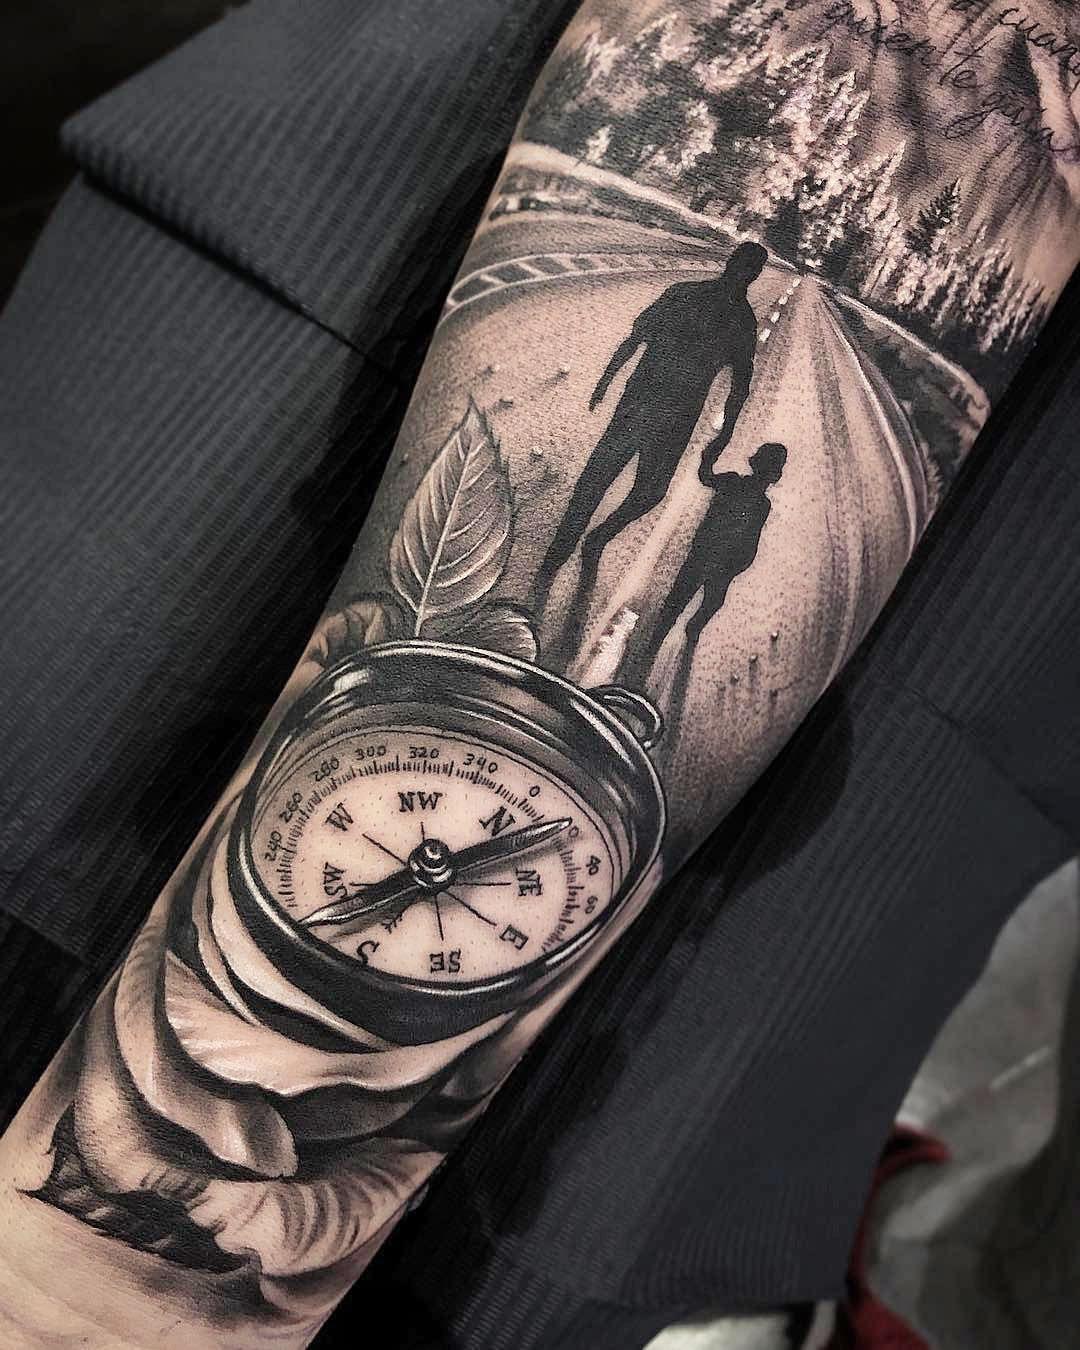 Brak Dostepnego Opisu Zdjecia Men Tattoos Arm Sleeve Tattoo For Son Arm Tattoos For Guys